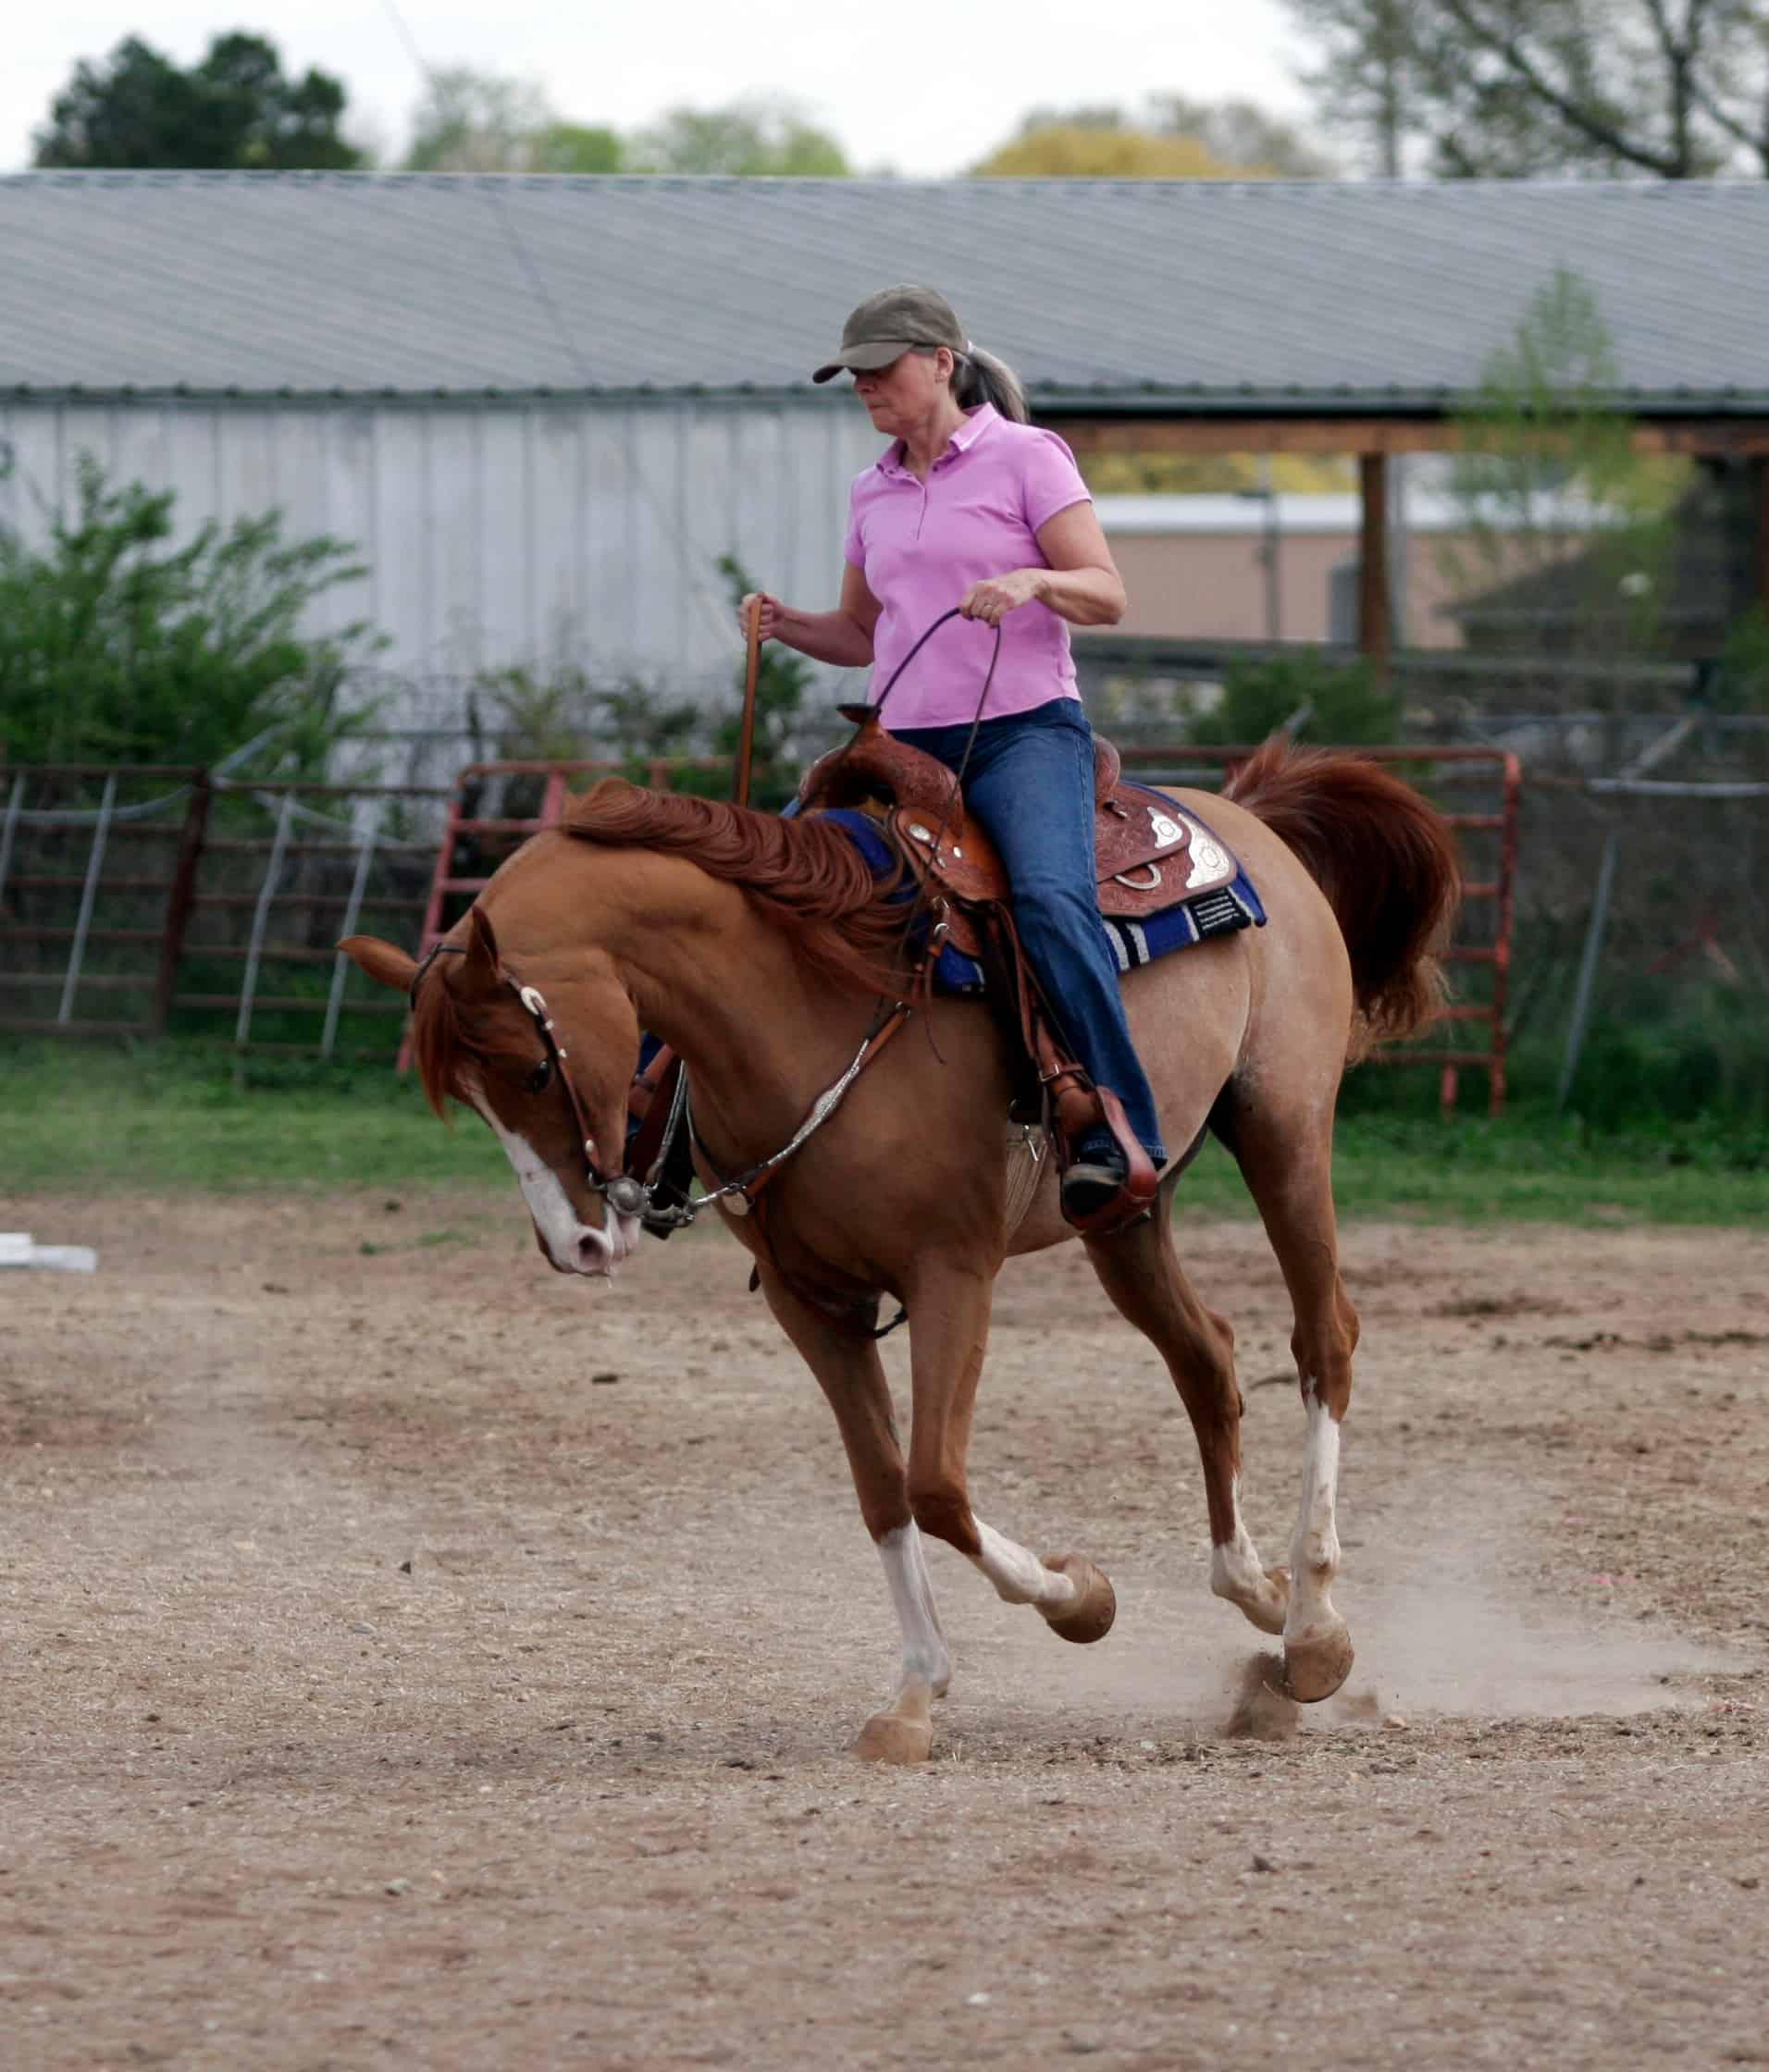 Woman cantering purebred arabian horse in western pleasure